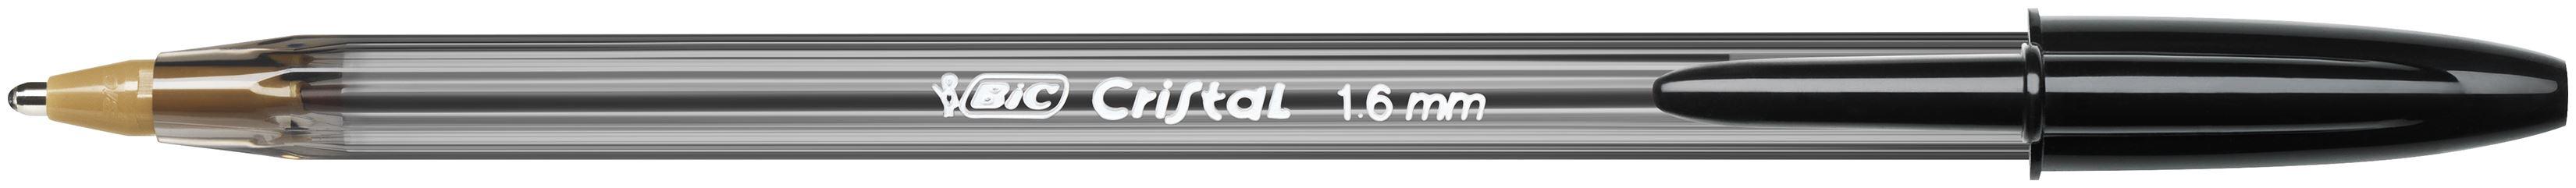 Pack of 50 Bic Cristal Large Ballpoint Pen 1.6mm Blue 880656